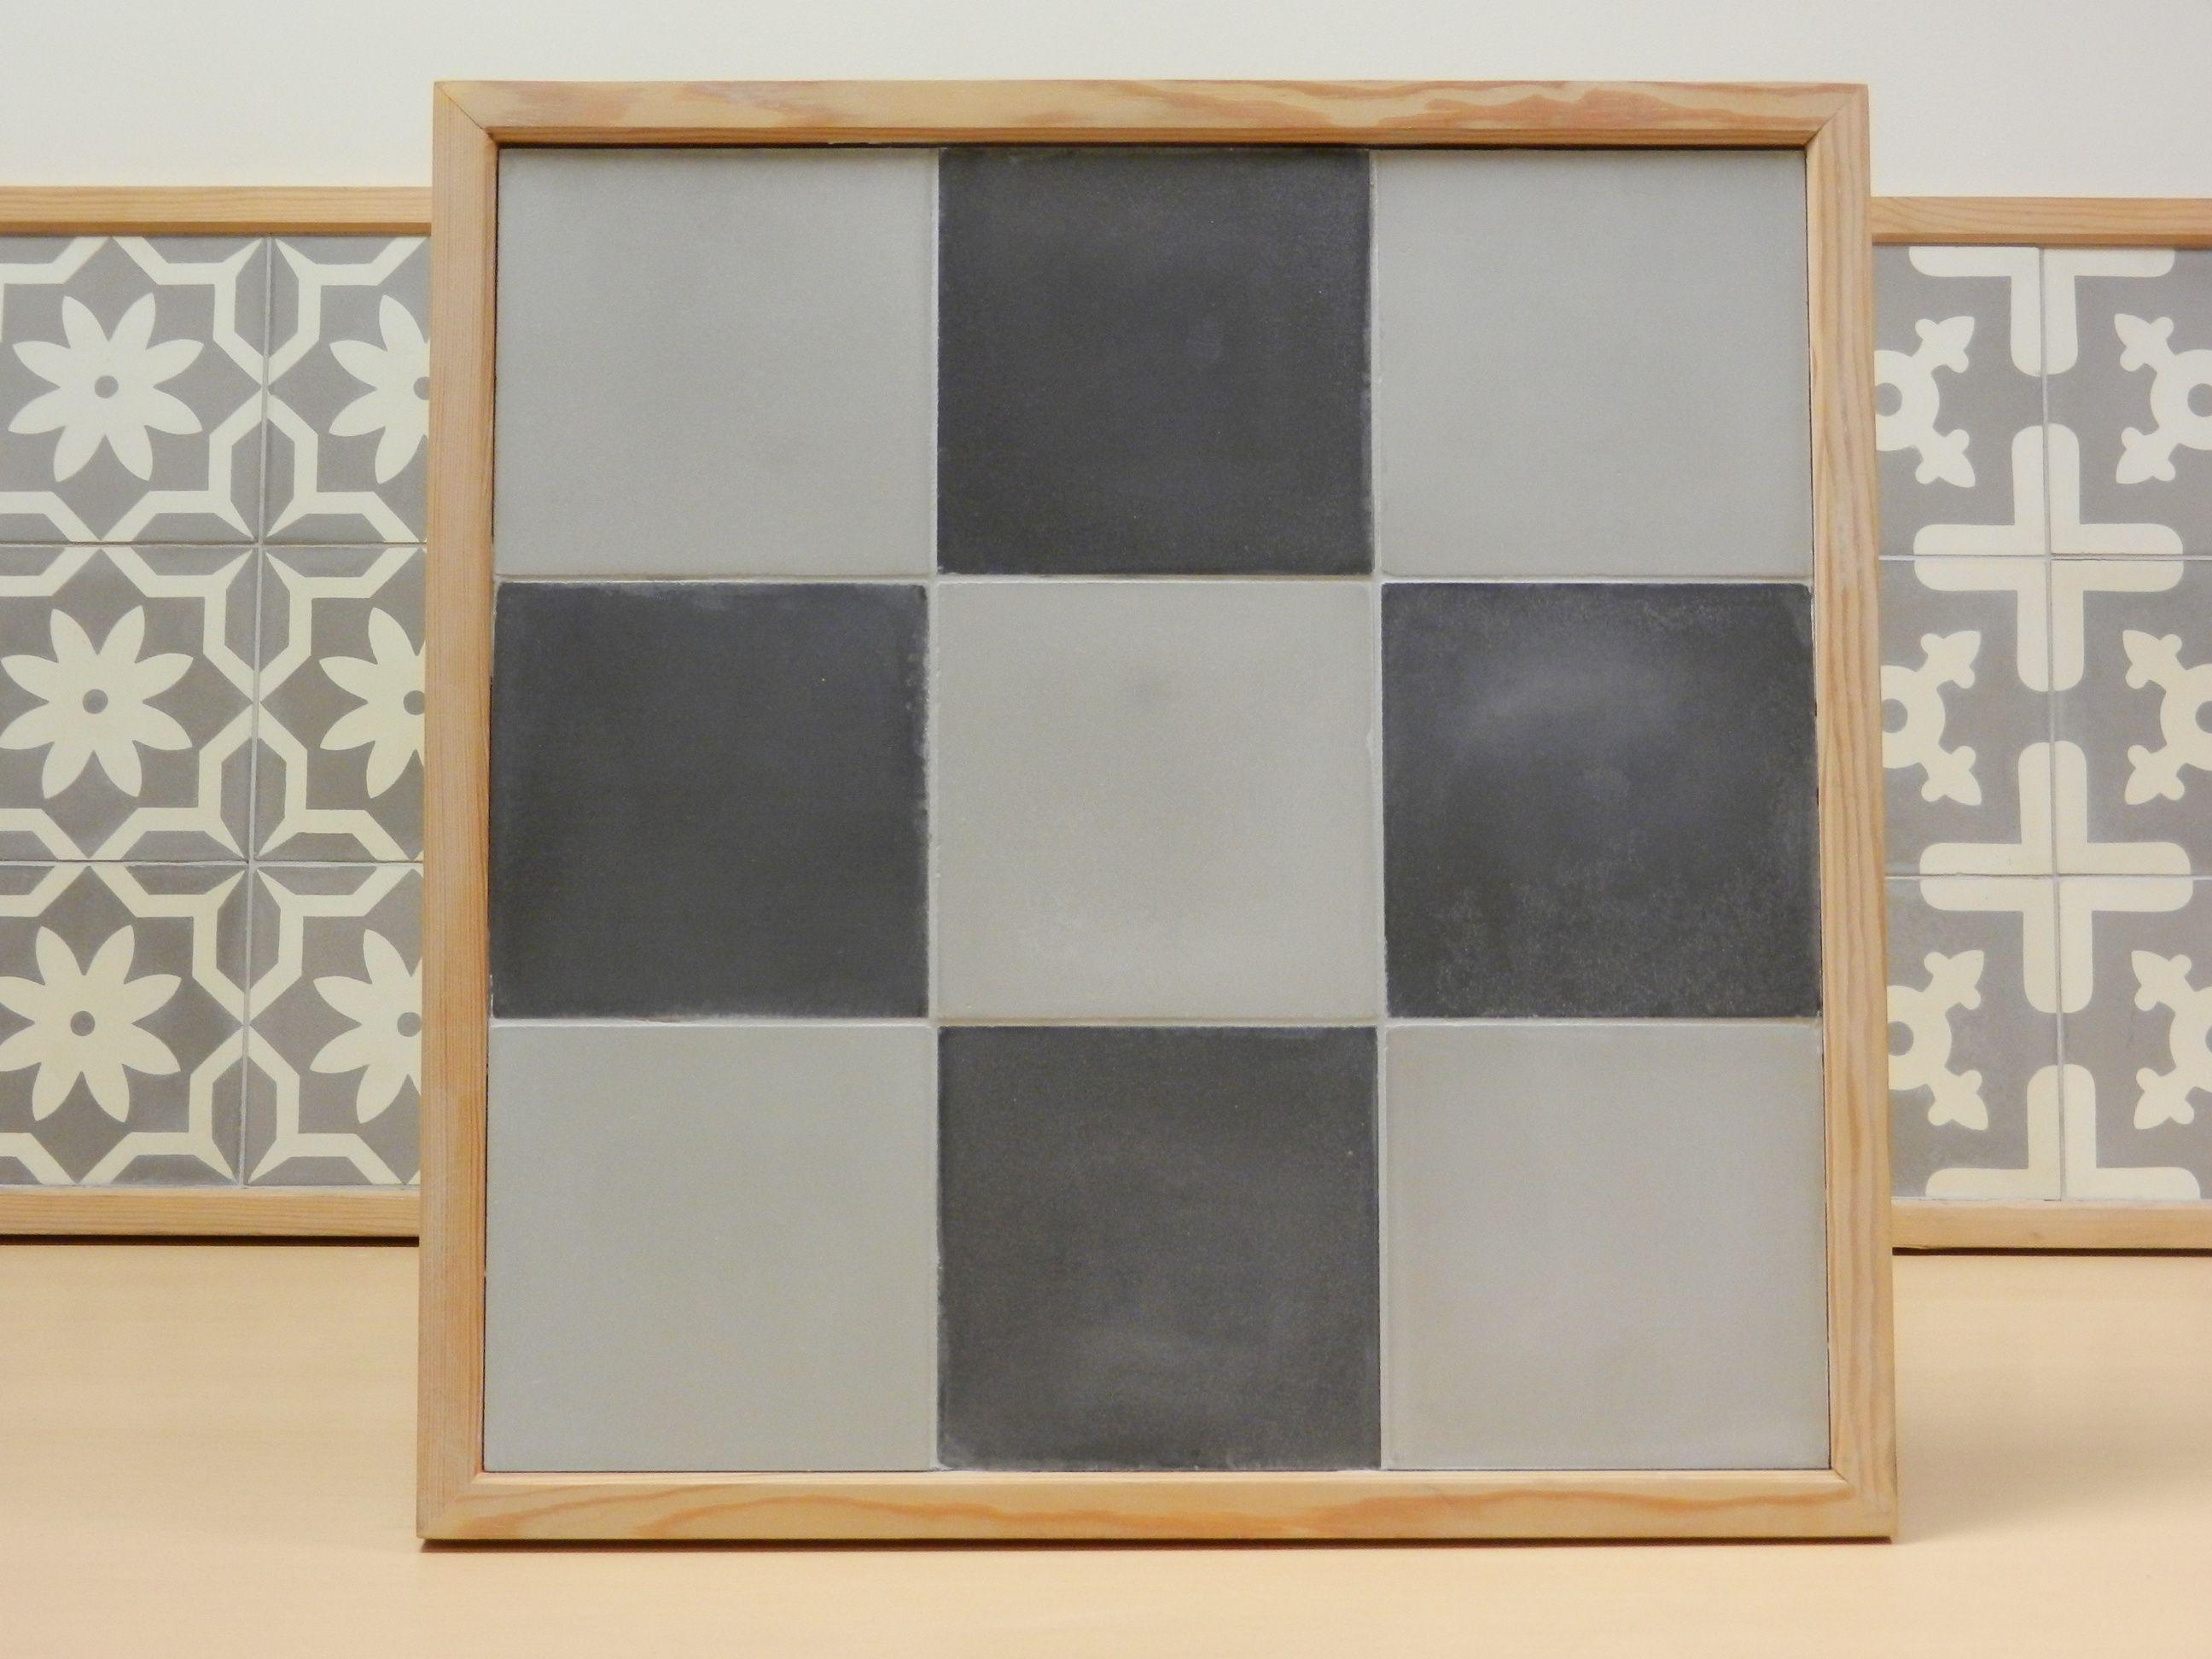 Handmade encaustic tiles, 15x15 cm format. 1517 Black / 1520 Light Grey. Brochure available.